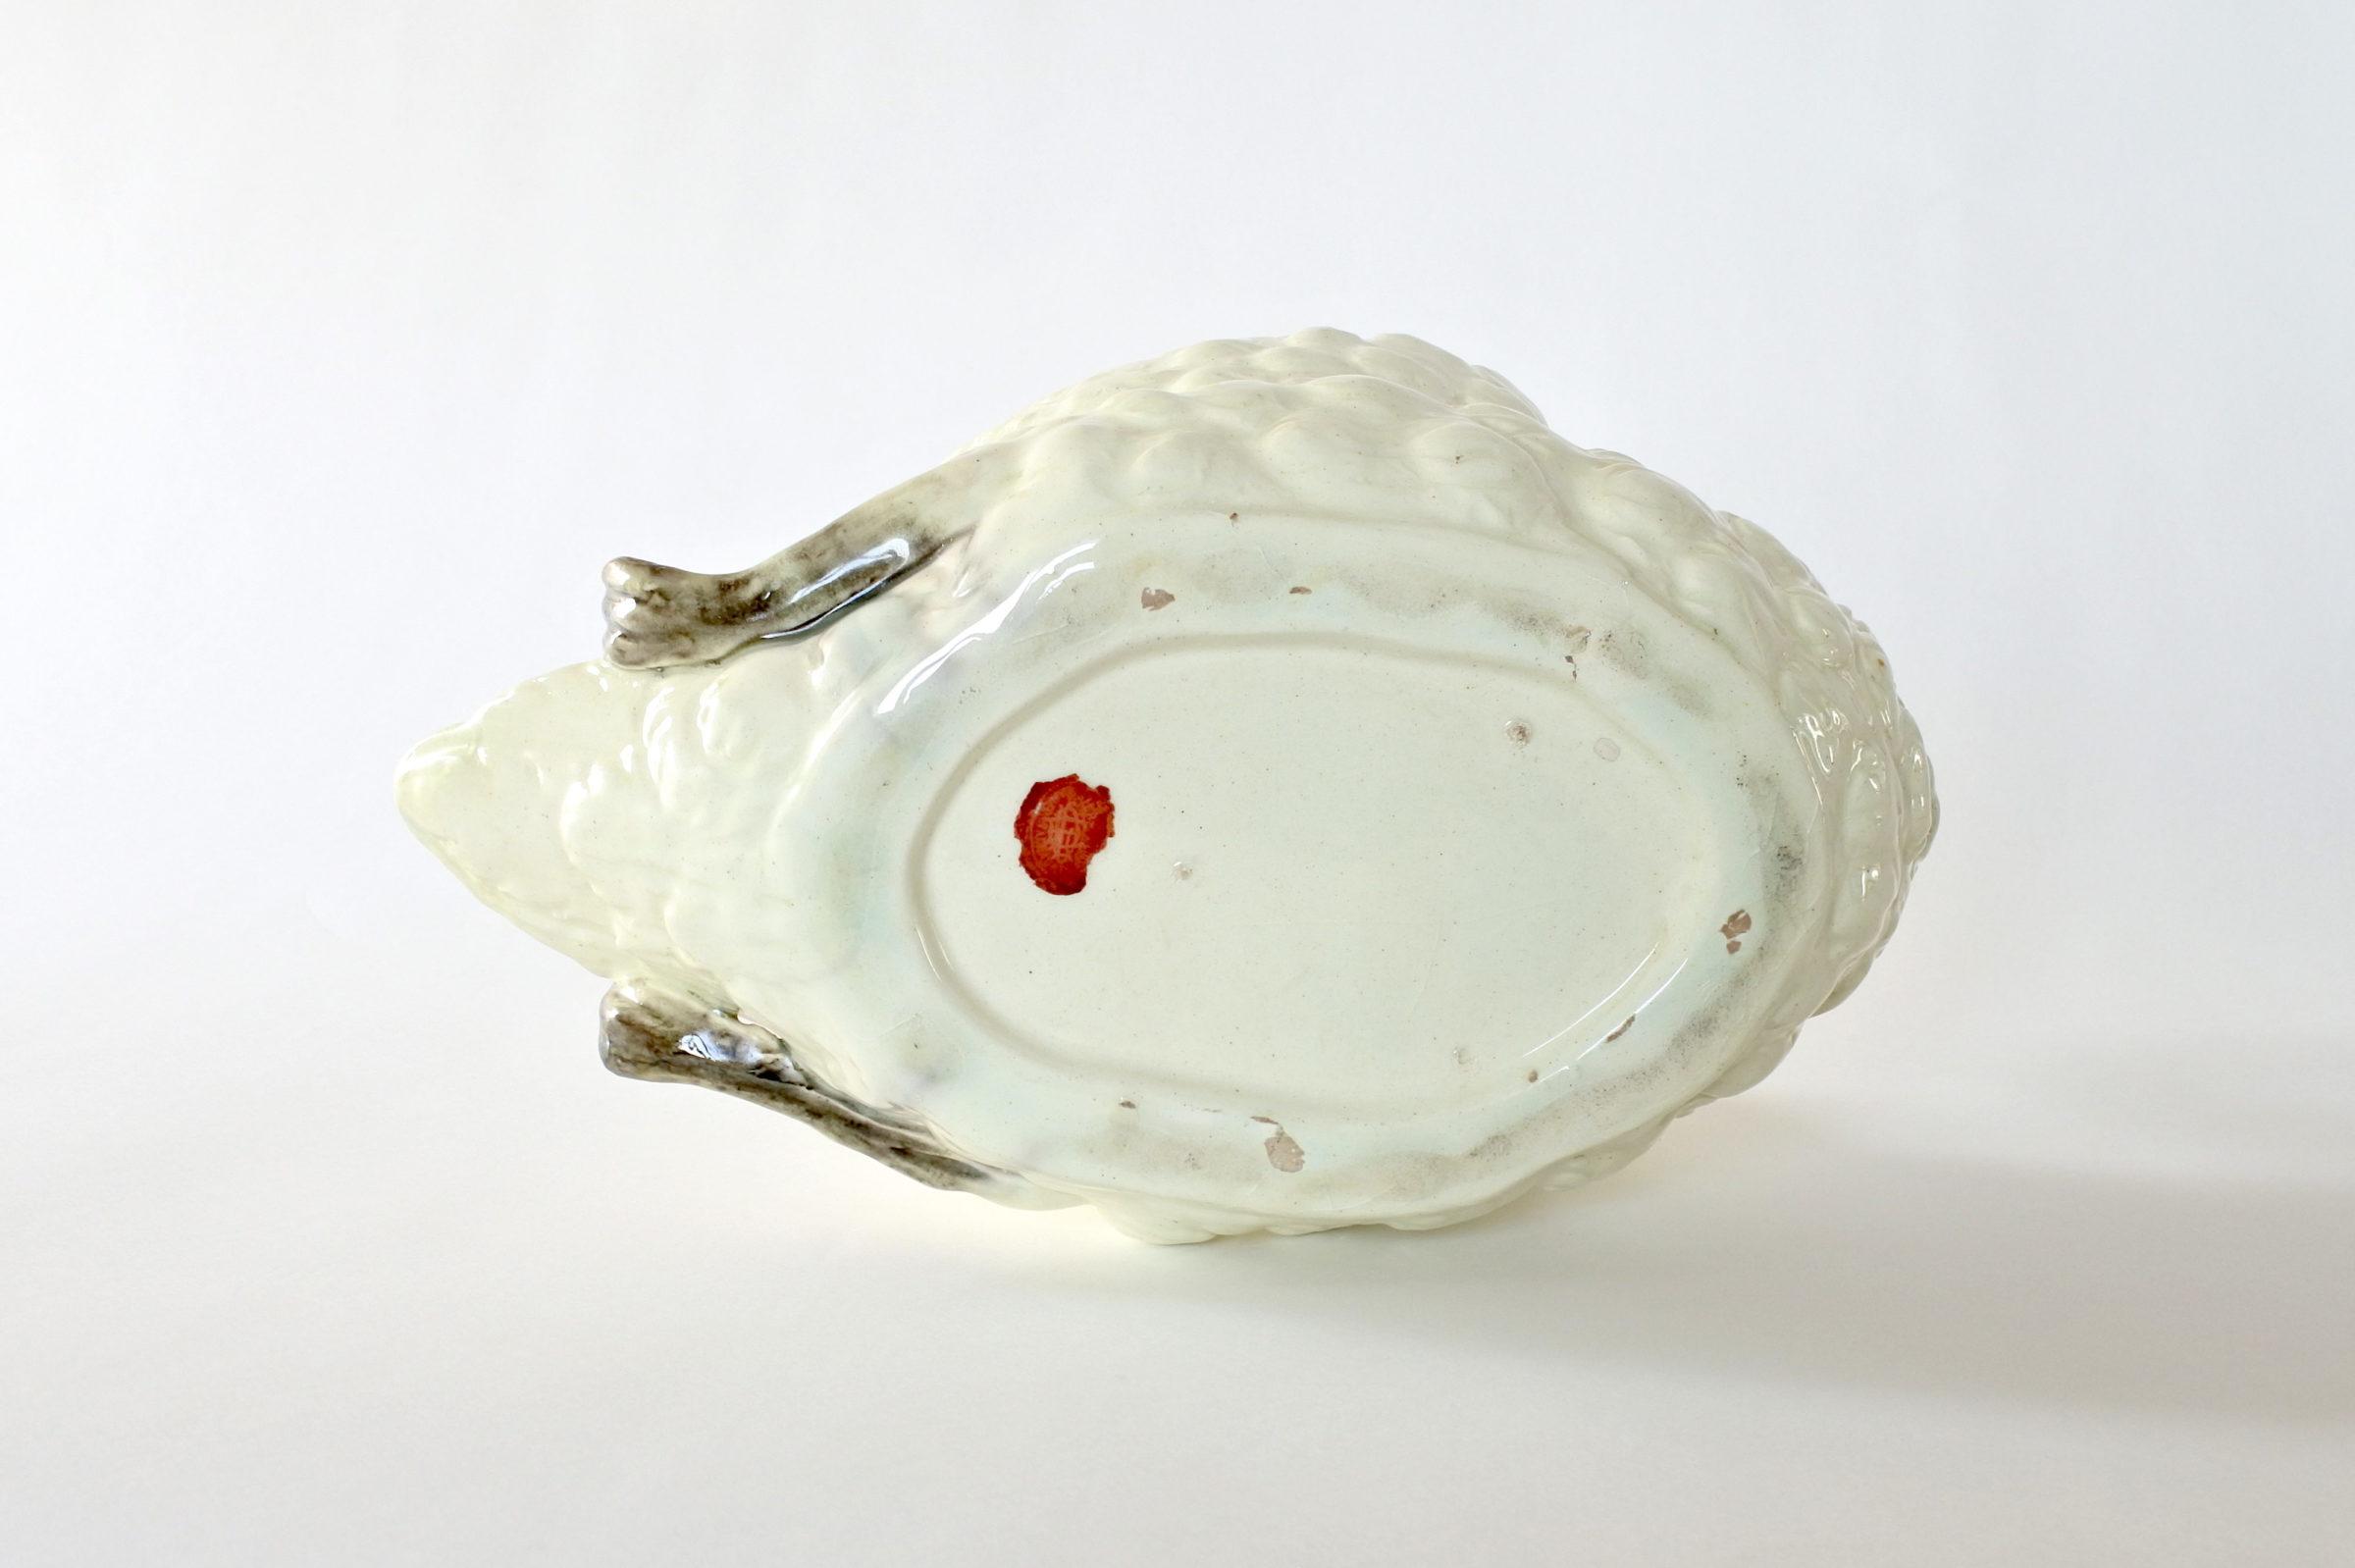 Cigno in ceramica barbotine con funzione di jardinière - Jérôme Massier Fils - 8